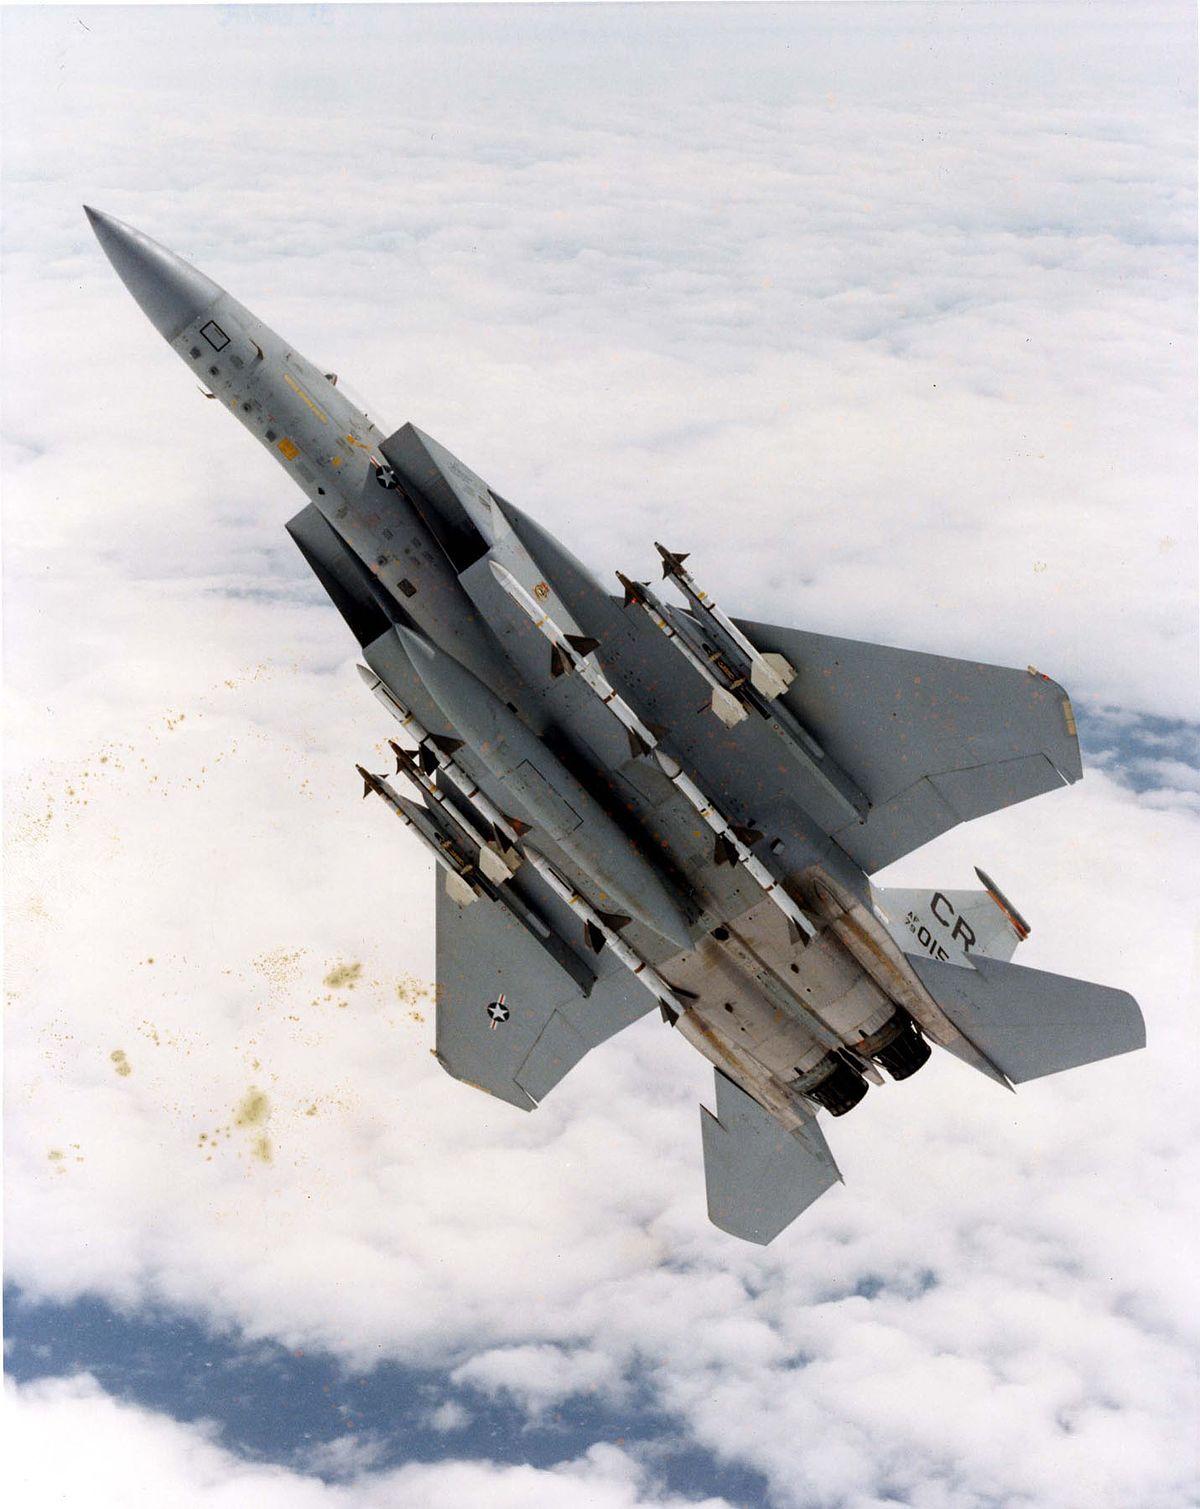 F 15ex Wiki : Category:F-15, Eagle, Wikimedia, Commons